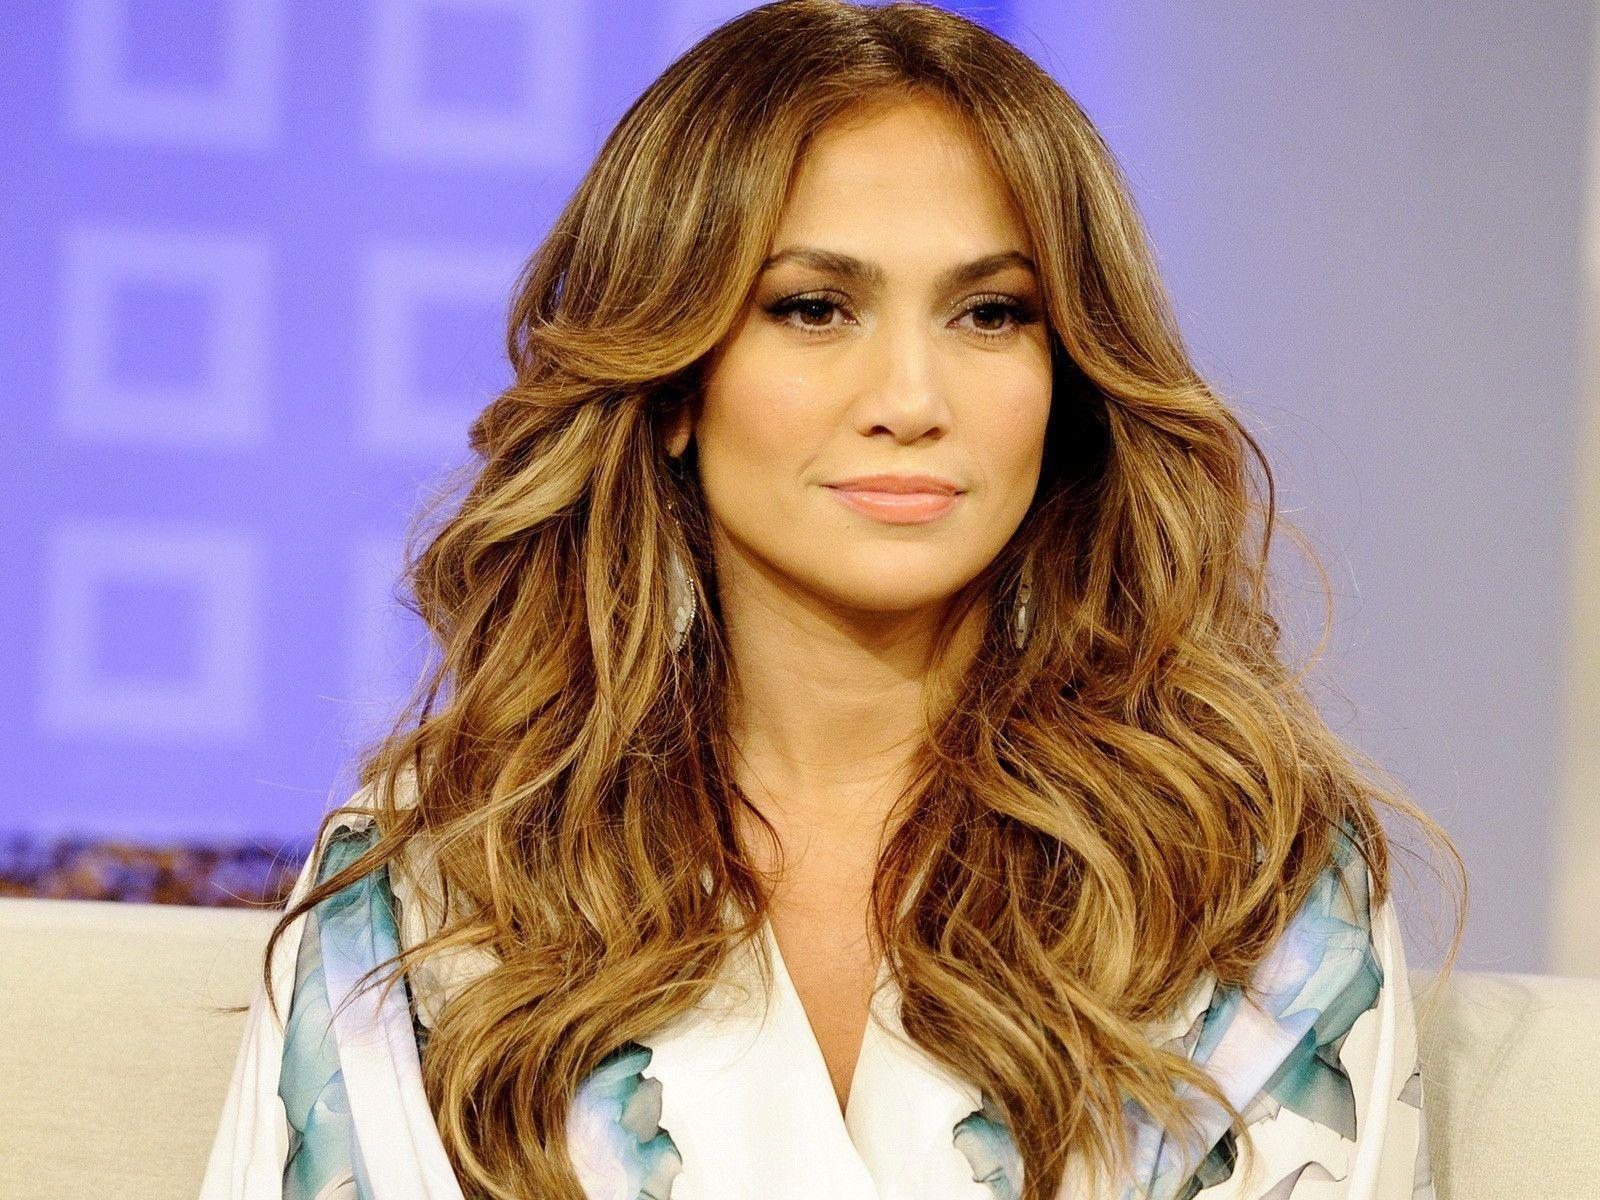 3b3e5c7df47 Jennifer Lopez 2014 Images - Wallpaper HD. Download